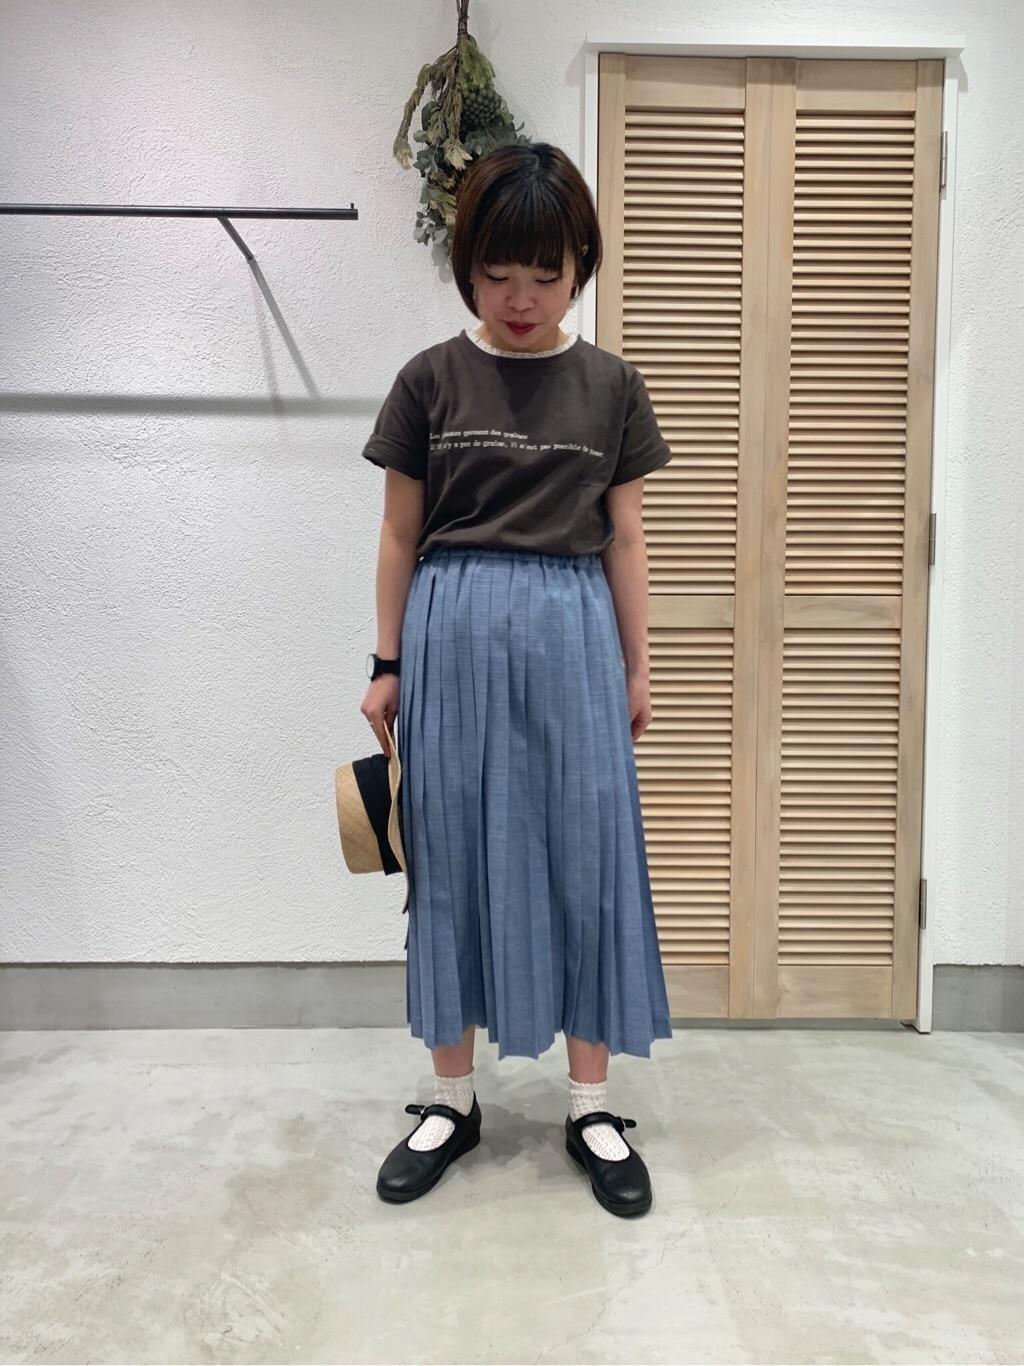 chambre de charme 横浜ジョイナス 身長:153cm 2020.04.11